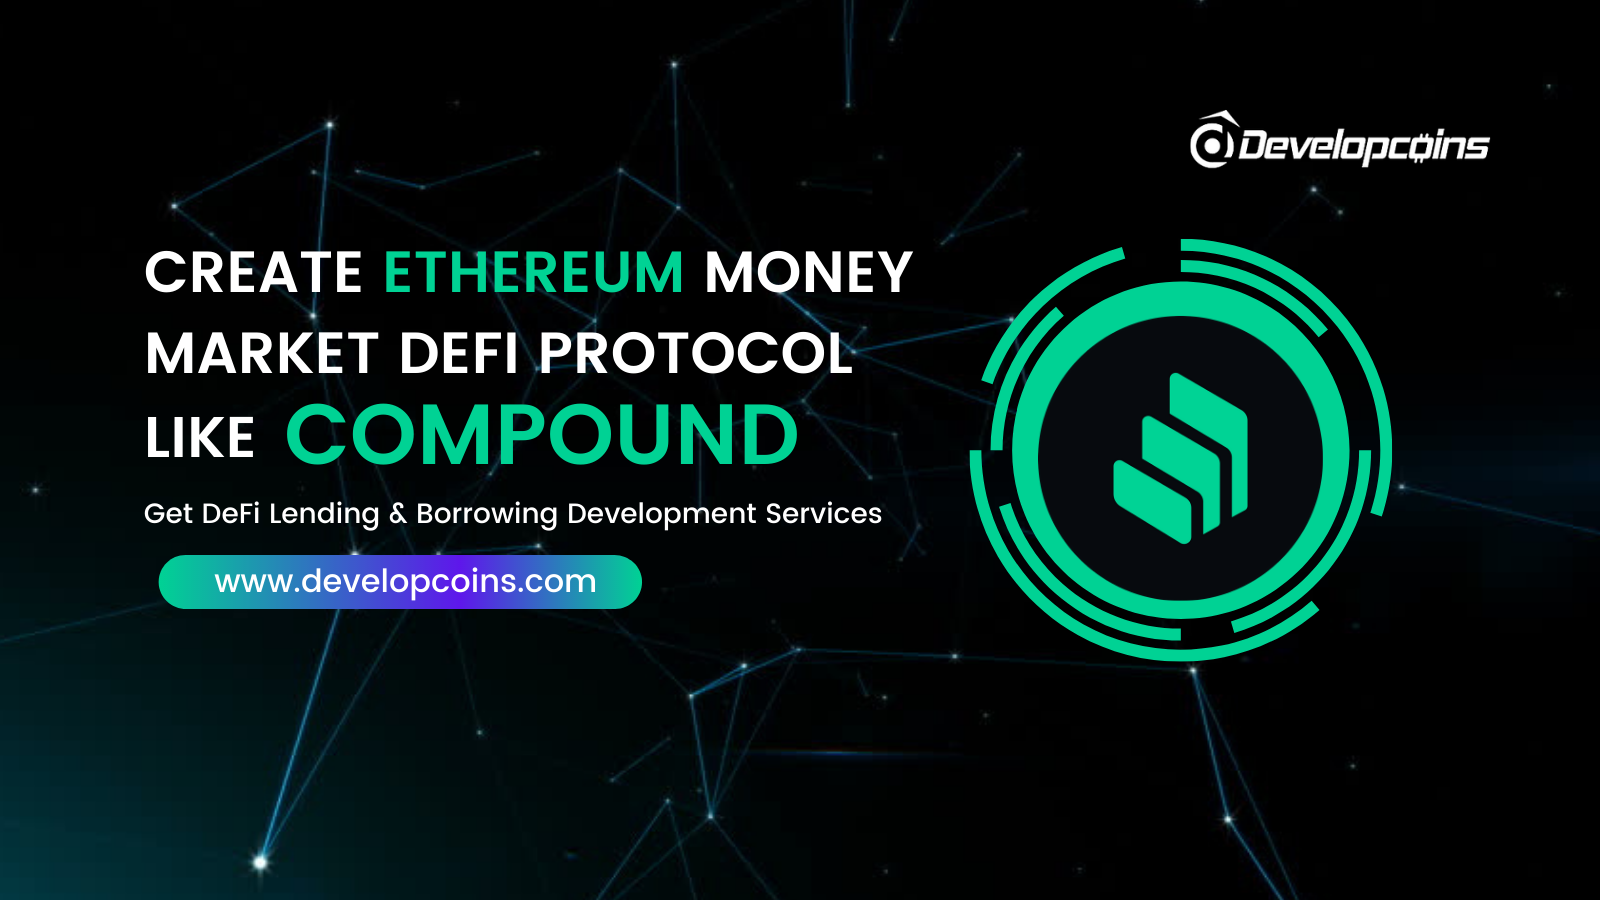 Create Ethereum Money Market DeFi Protocol like Compound